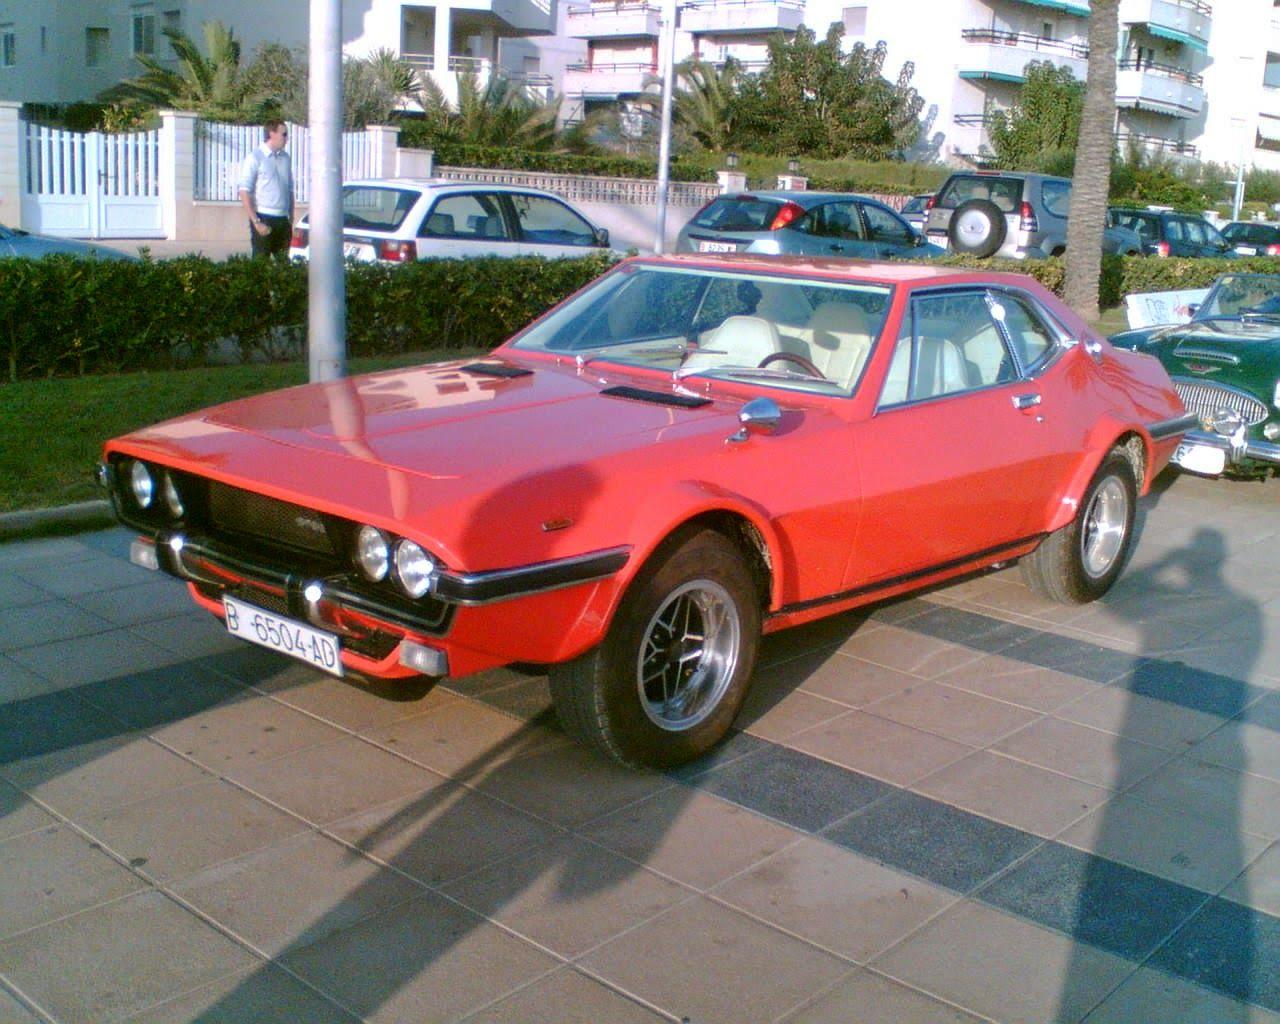 1972 Barreiros Dodge 3700 Boulevard by Serra, Spain